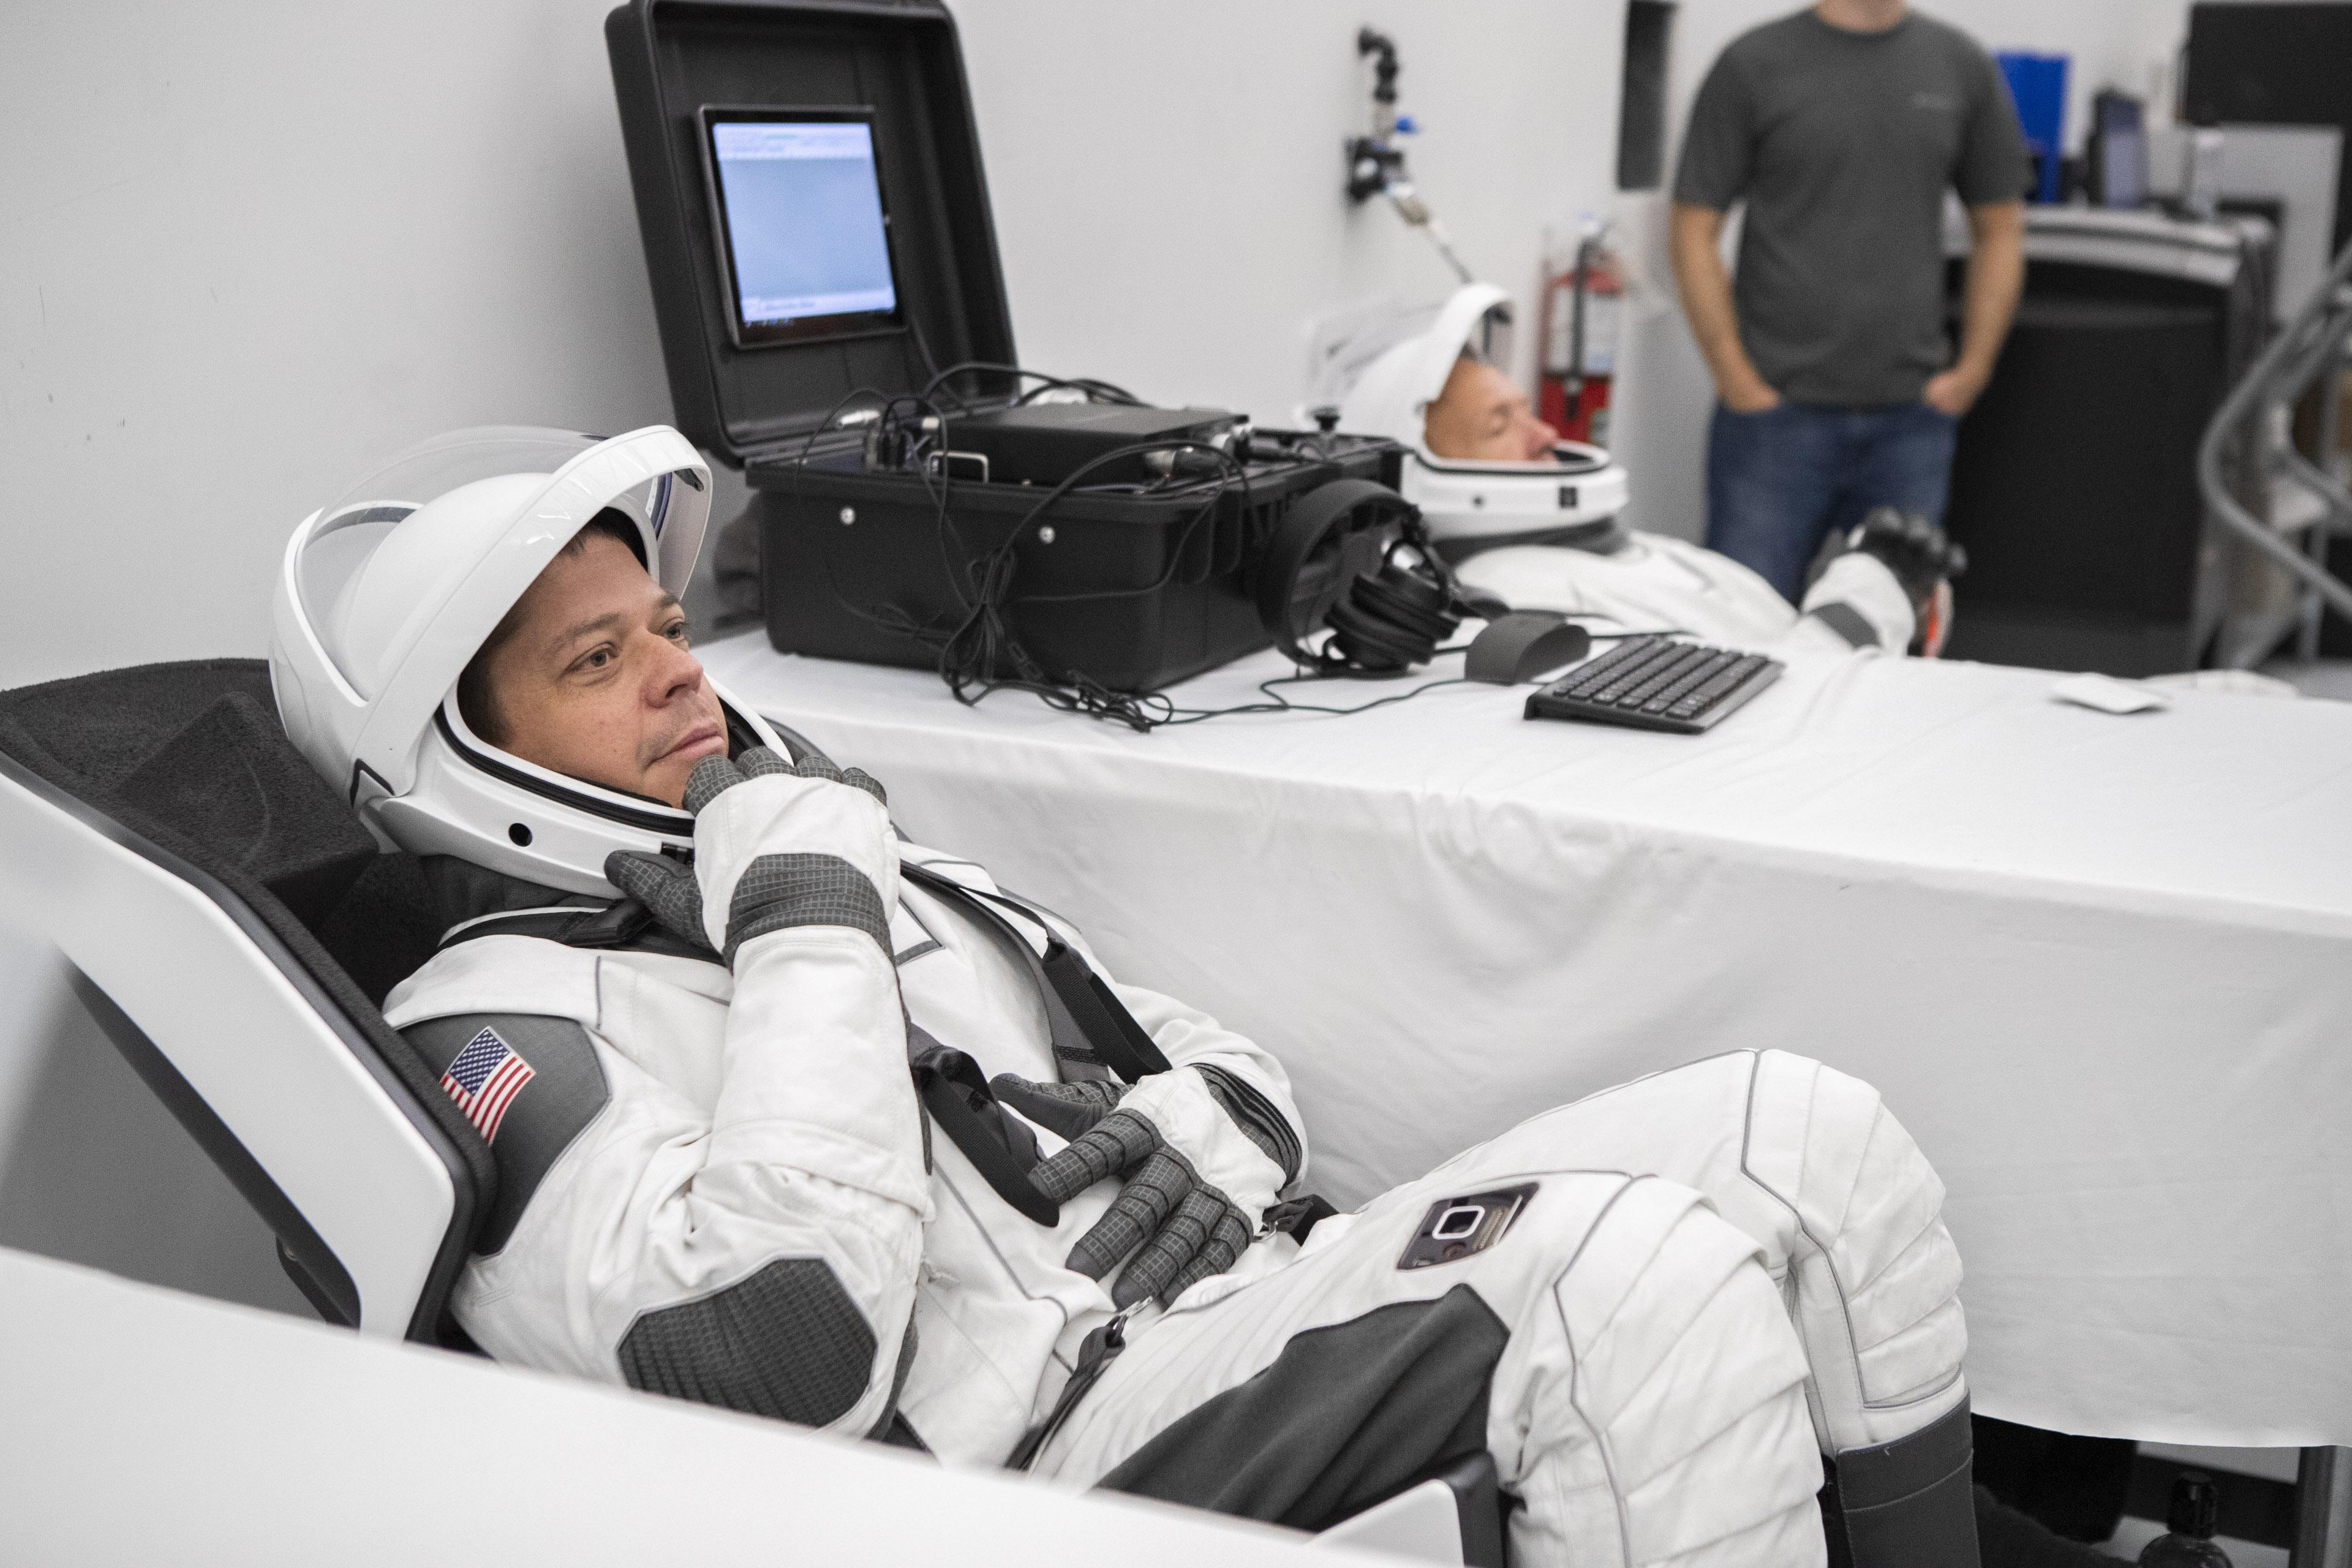 астронавт Хёрли, интерфейс ЖОБ на ноге.